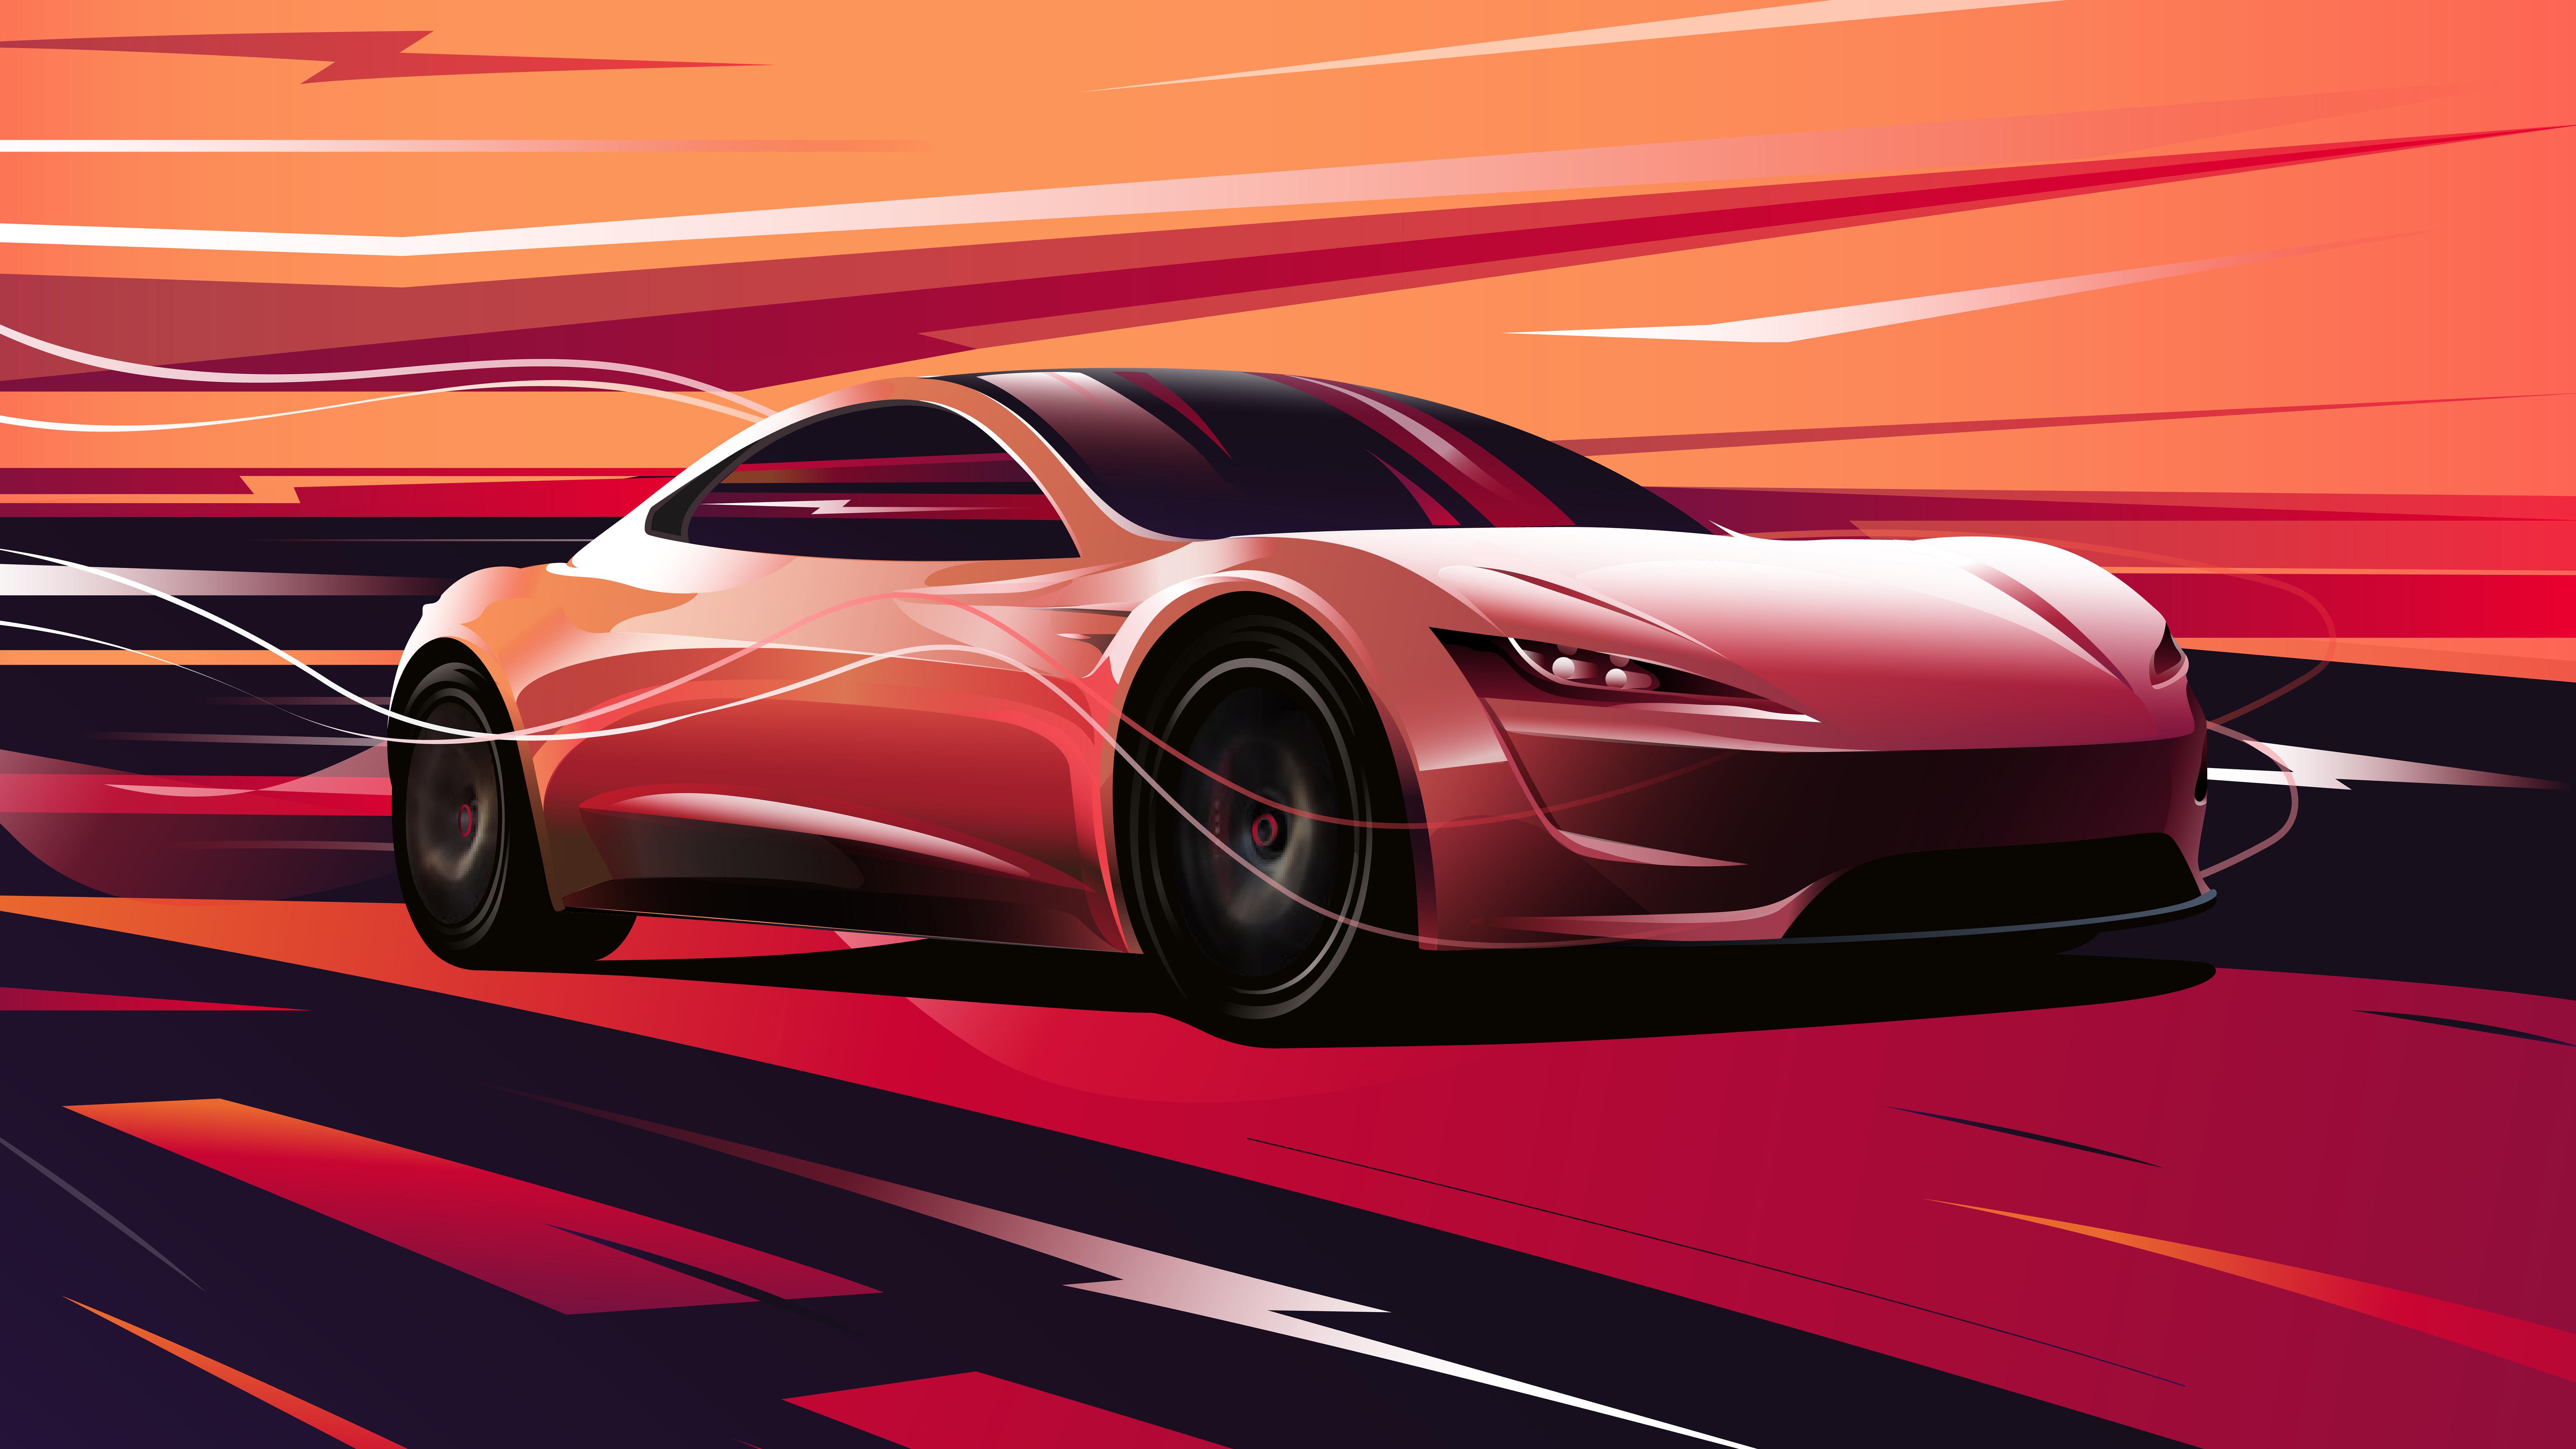 Tesla Roadster 2020 Wallpaper 4k 7680x4320 Download Hd Wallpaper Wallpapertip